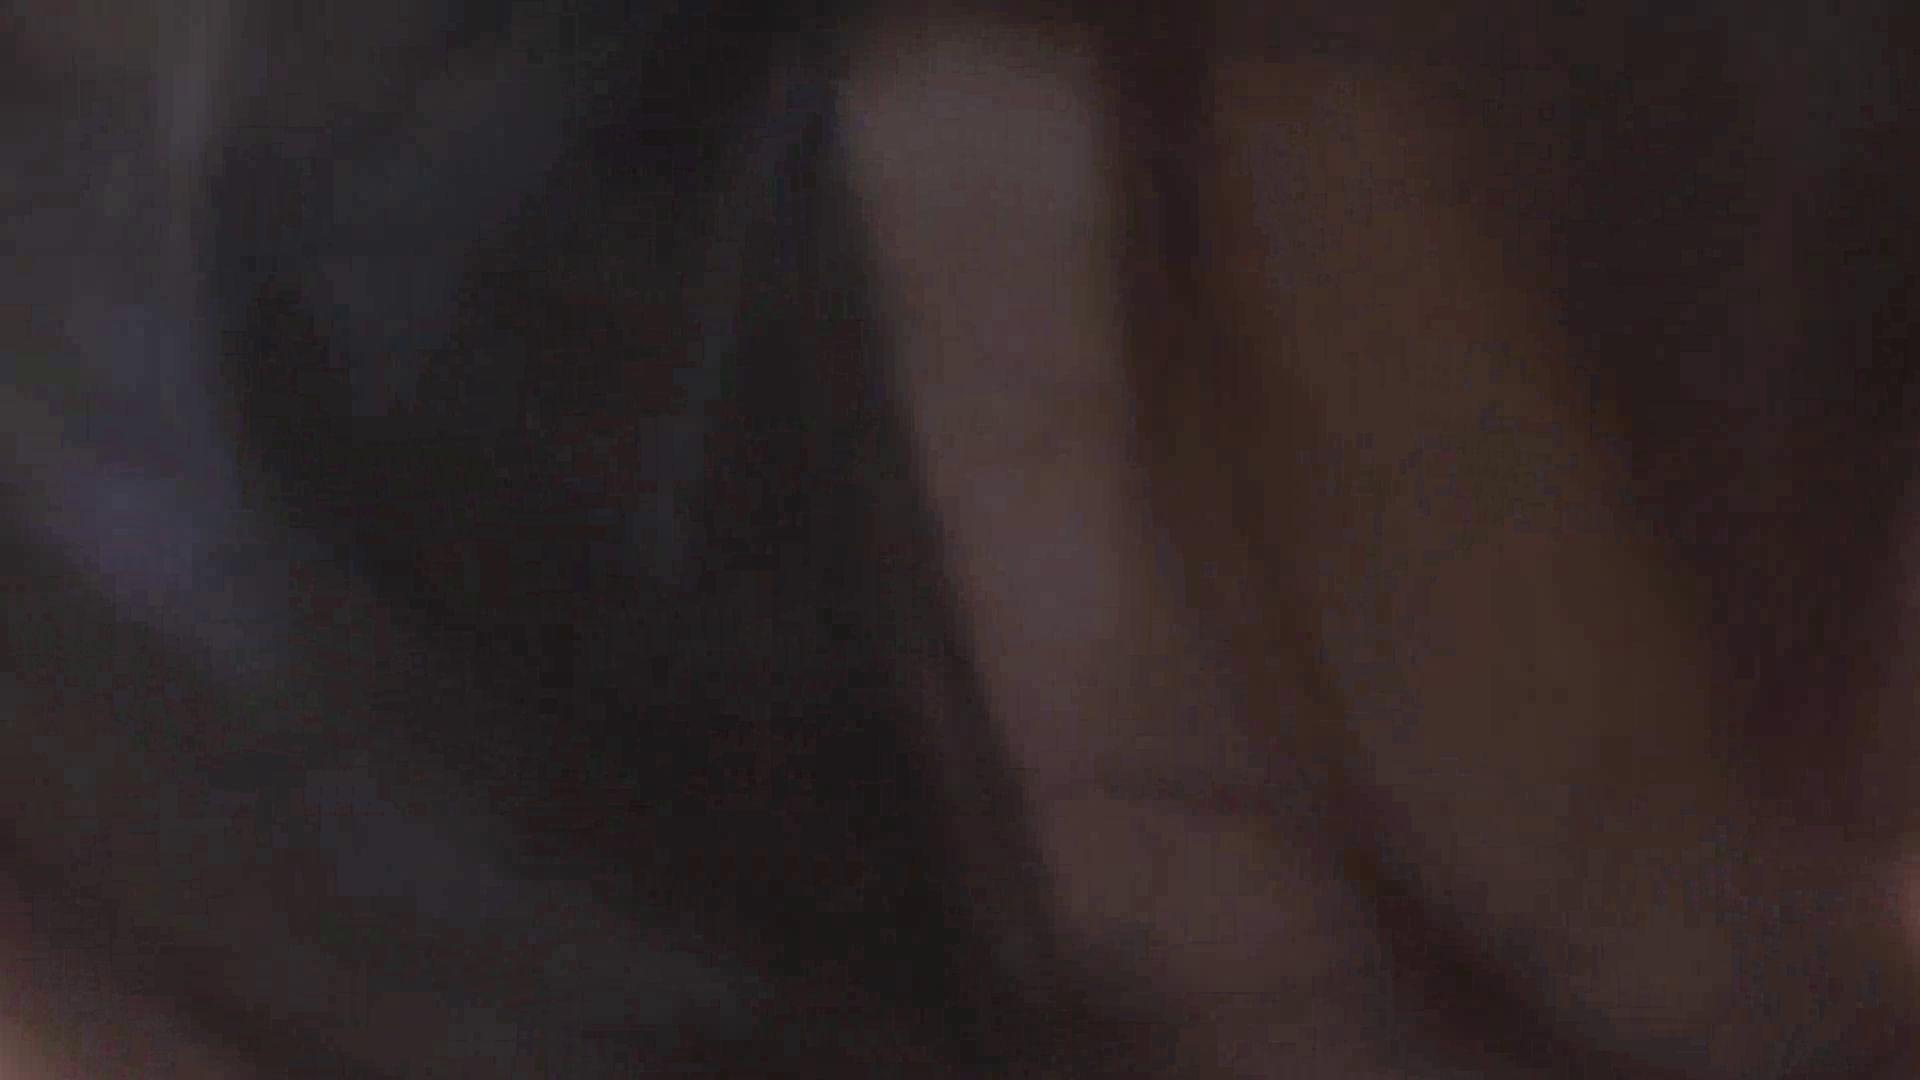 Hで可愛くてケシカラン! Vol.03 OLのエッチ オメコ動画キャプチャ 76pic 44